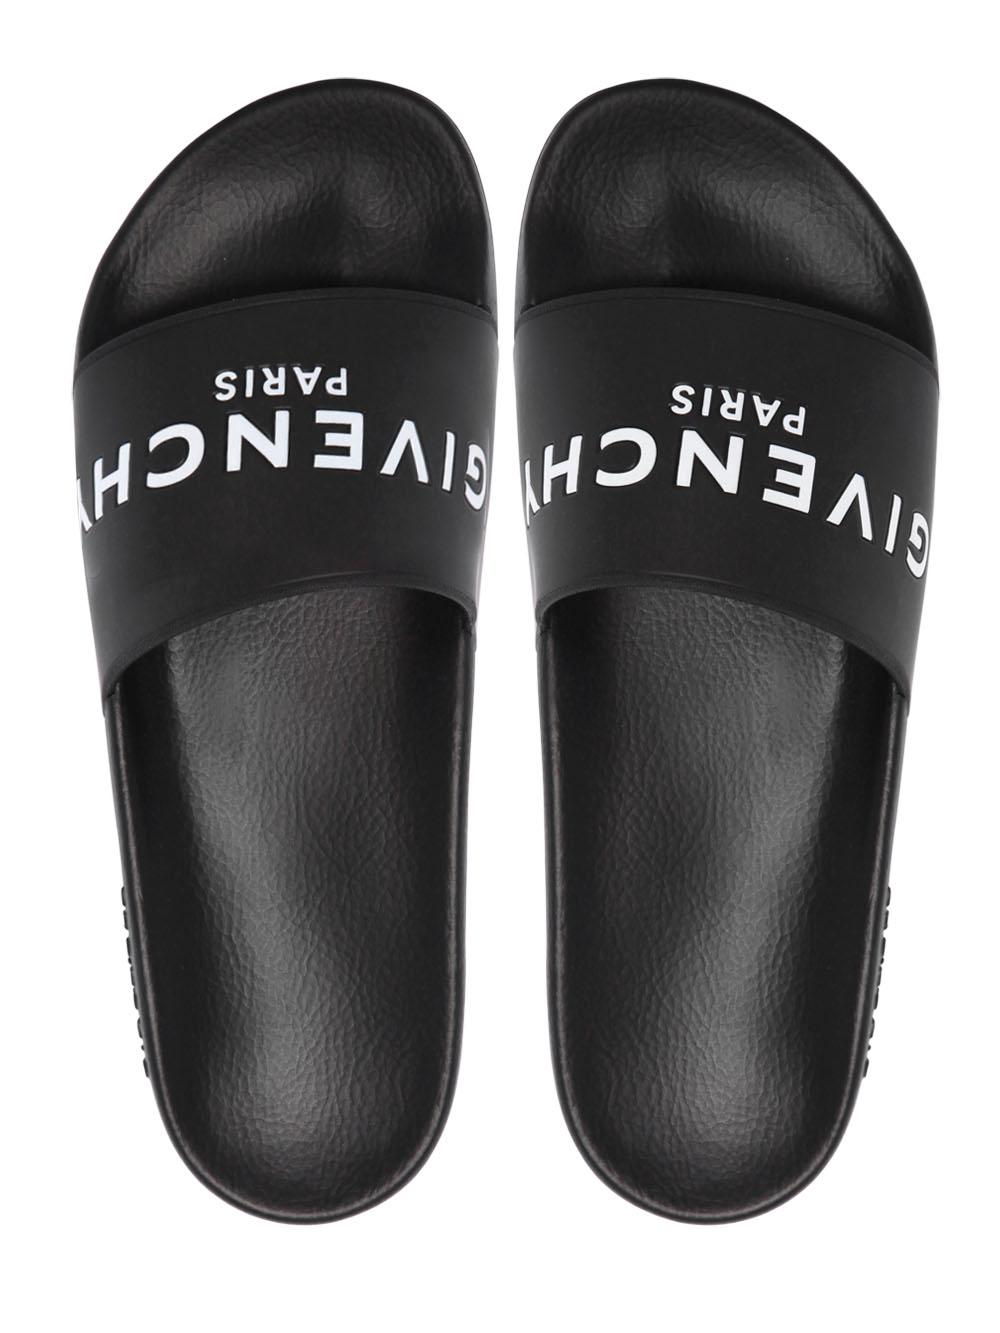 a75a6ecc57c Lyst - Givenchy Logo Rubber Slide Sandals in Black for Men